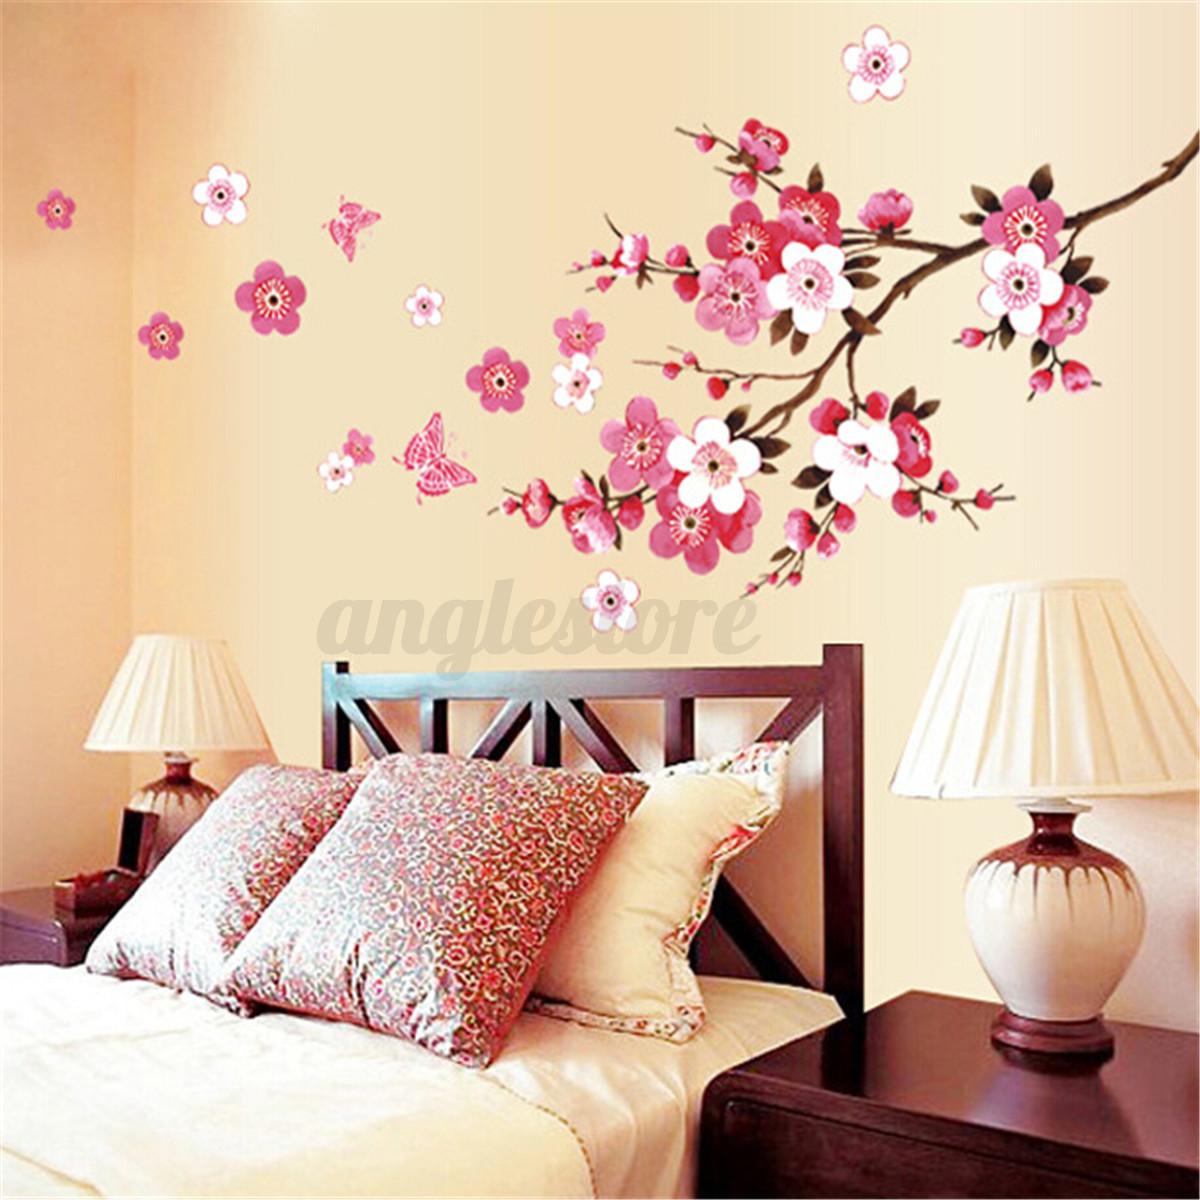 Large sakura flower removable wall sticker paper mural art decal large sakura flower removable wall sticker paper mural amipublicfo Gallery